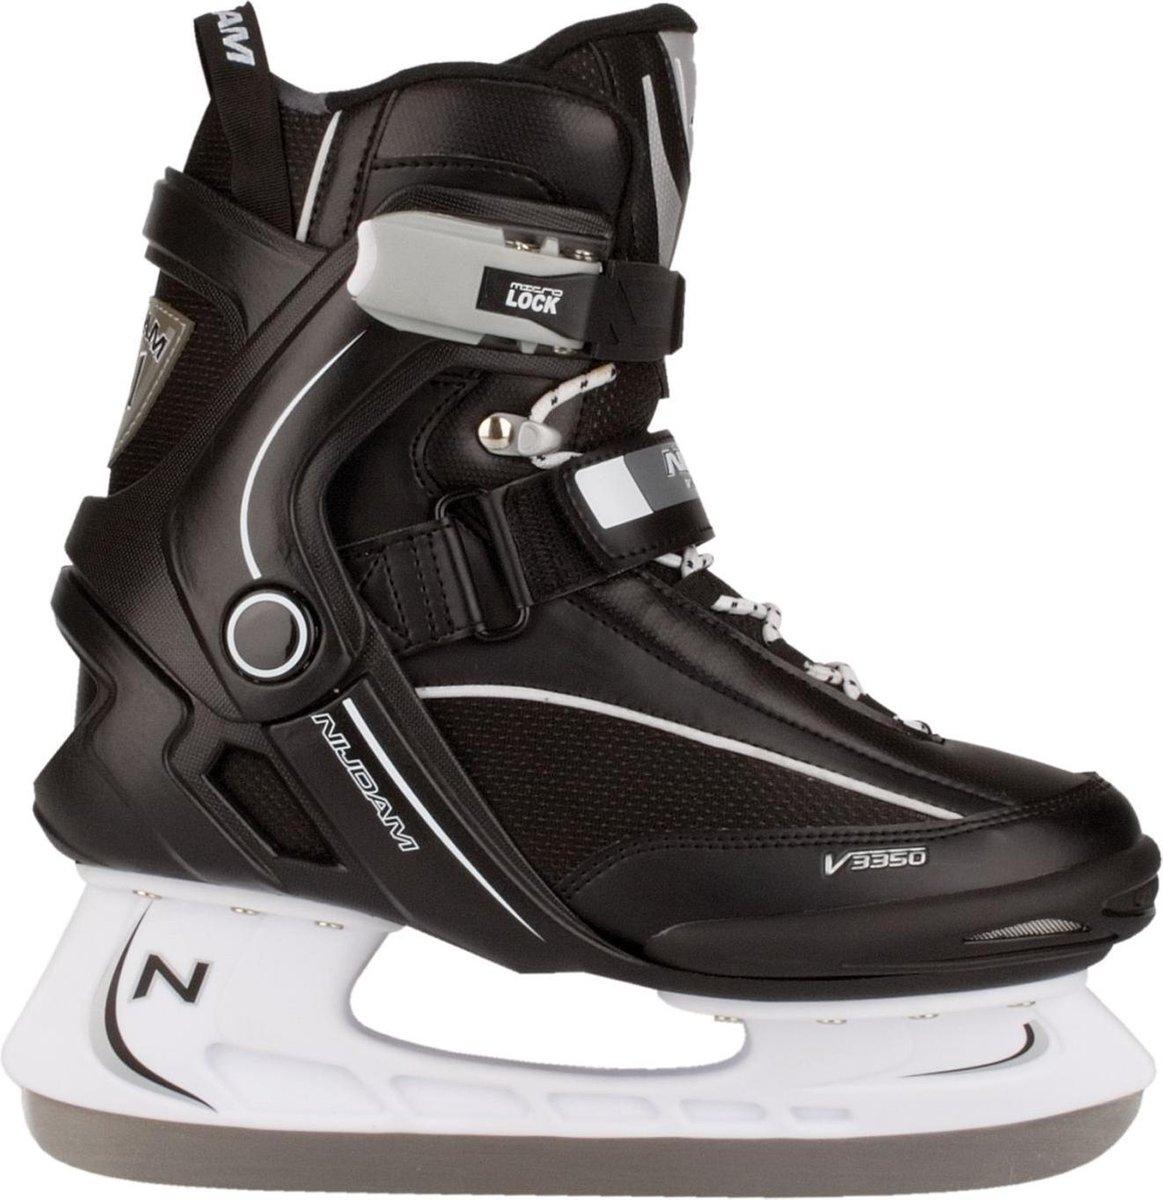 Nijdam IJshockeyschaats - Semi-Softboot - Zwart/Wit - Maat 44